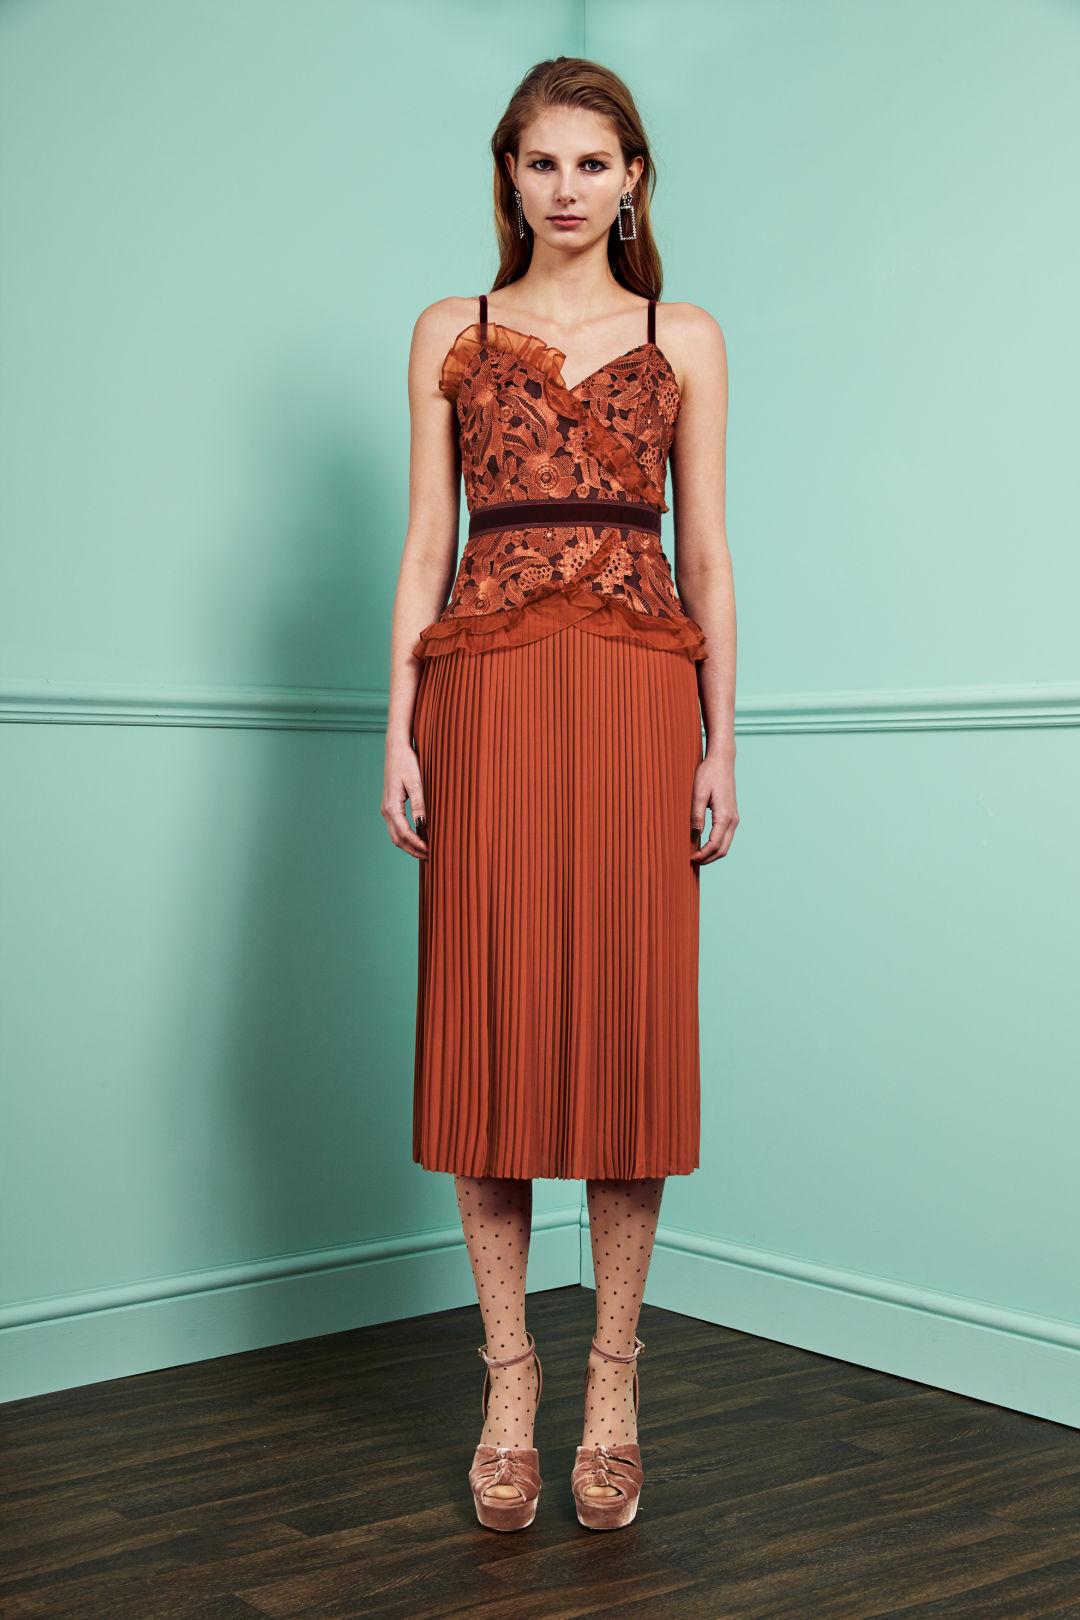 42.klick dress 945 zbkrvl